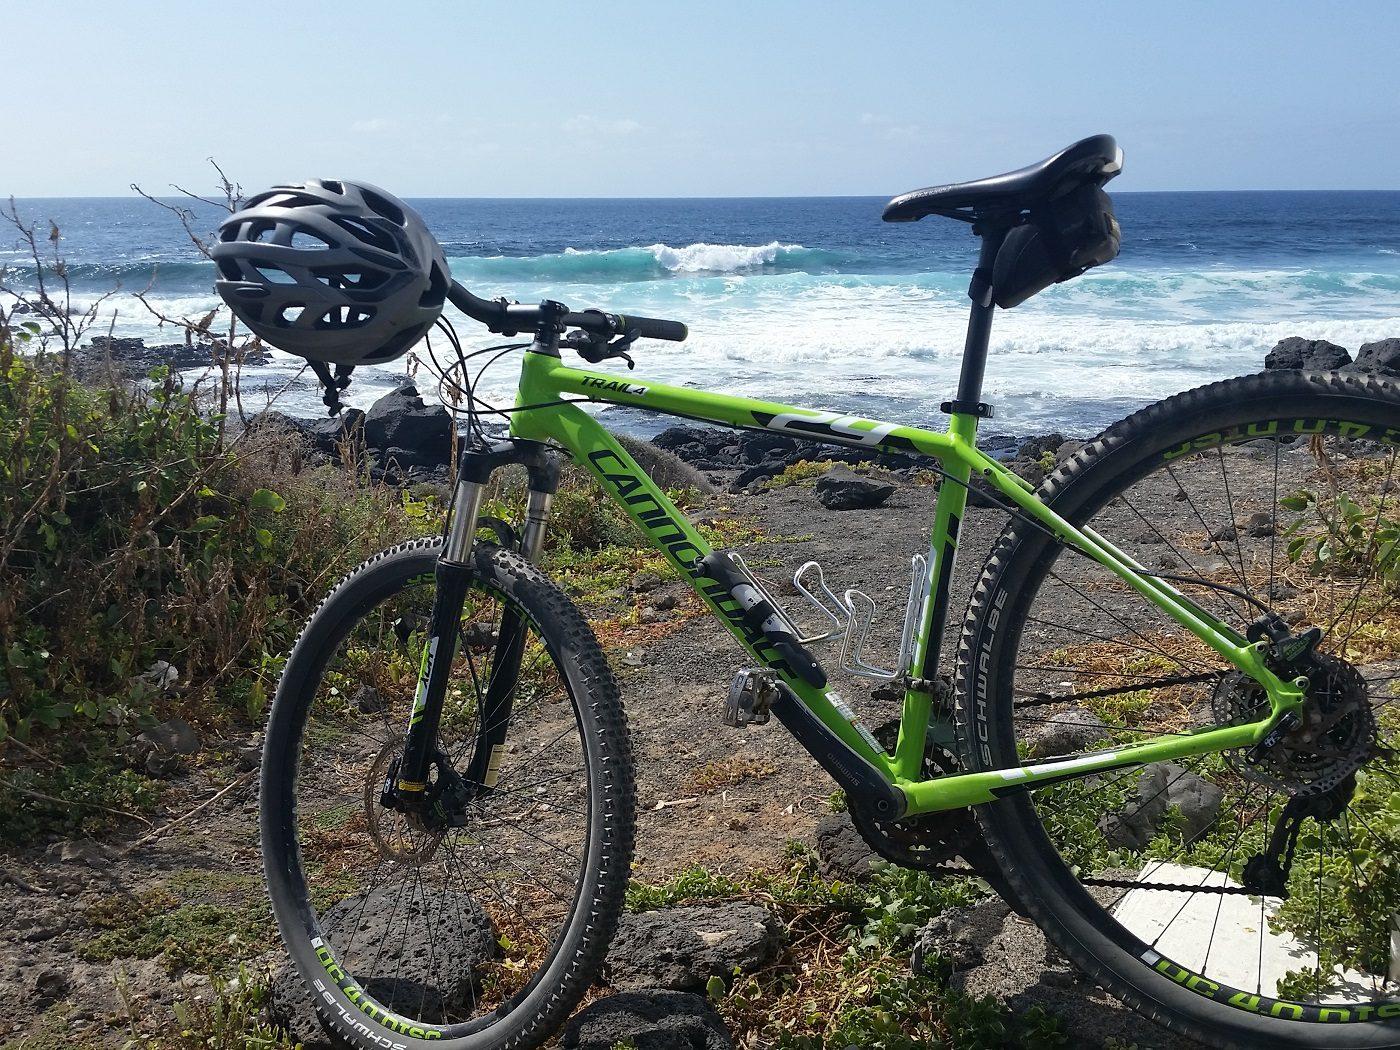 Club La Santa Lanzarote Mountainbike